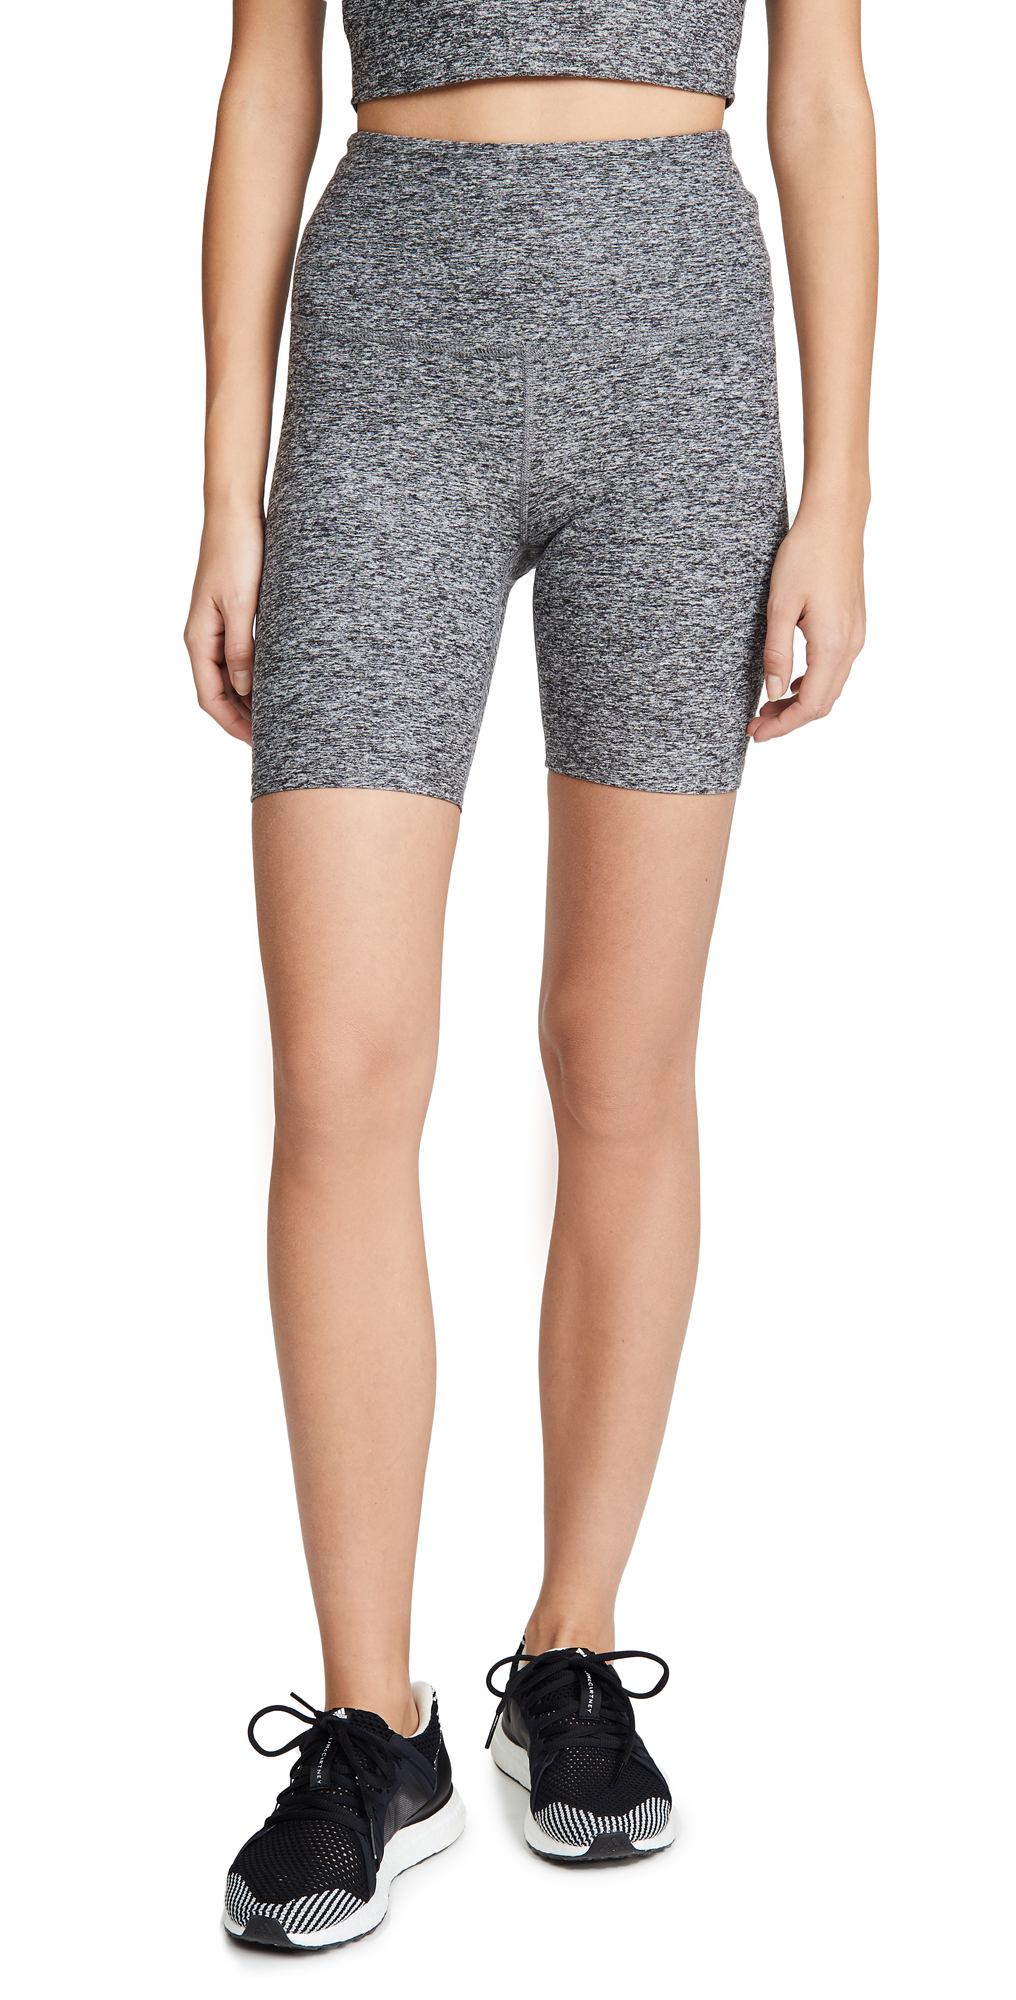 Beyond Yoga Spacedye High Waisted Shorts